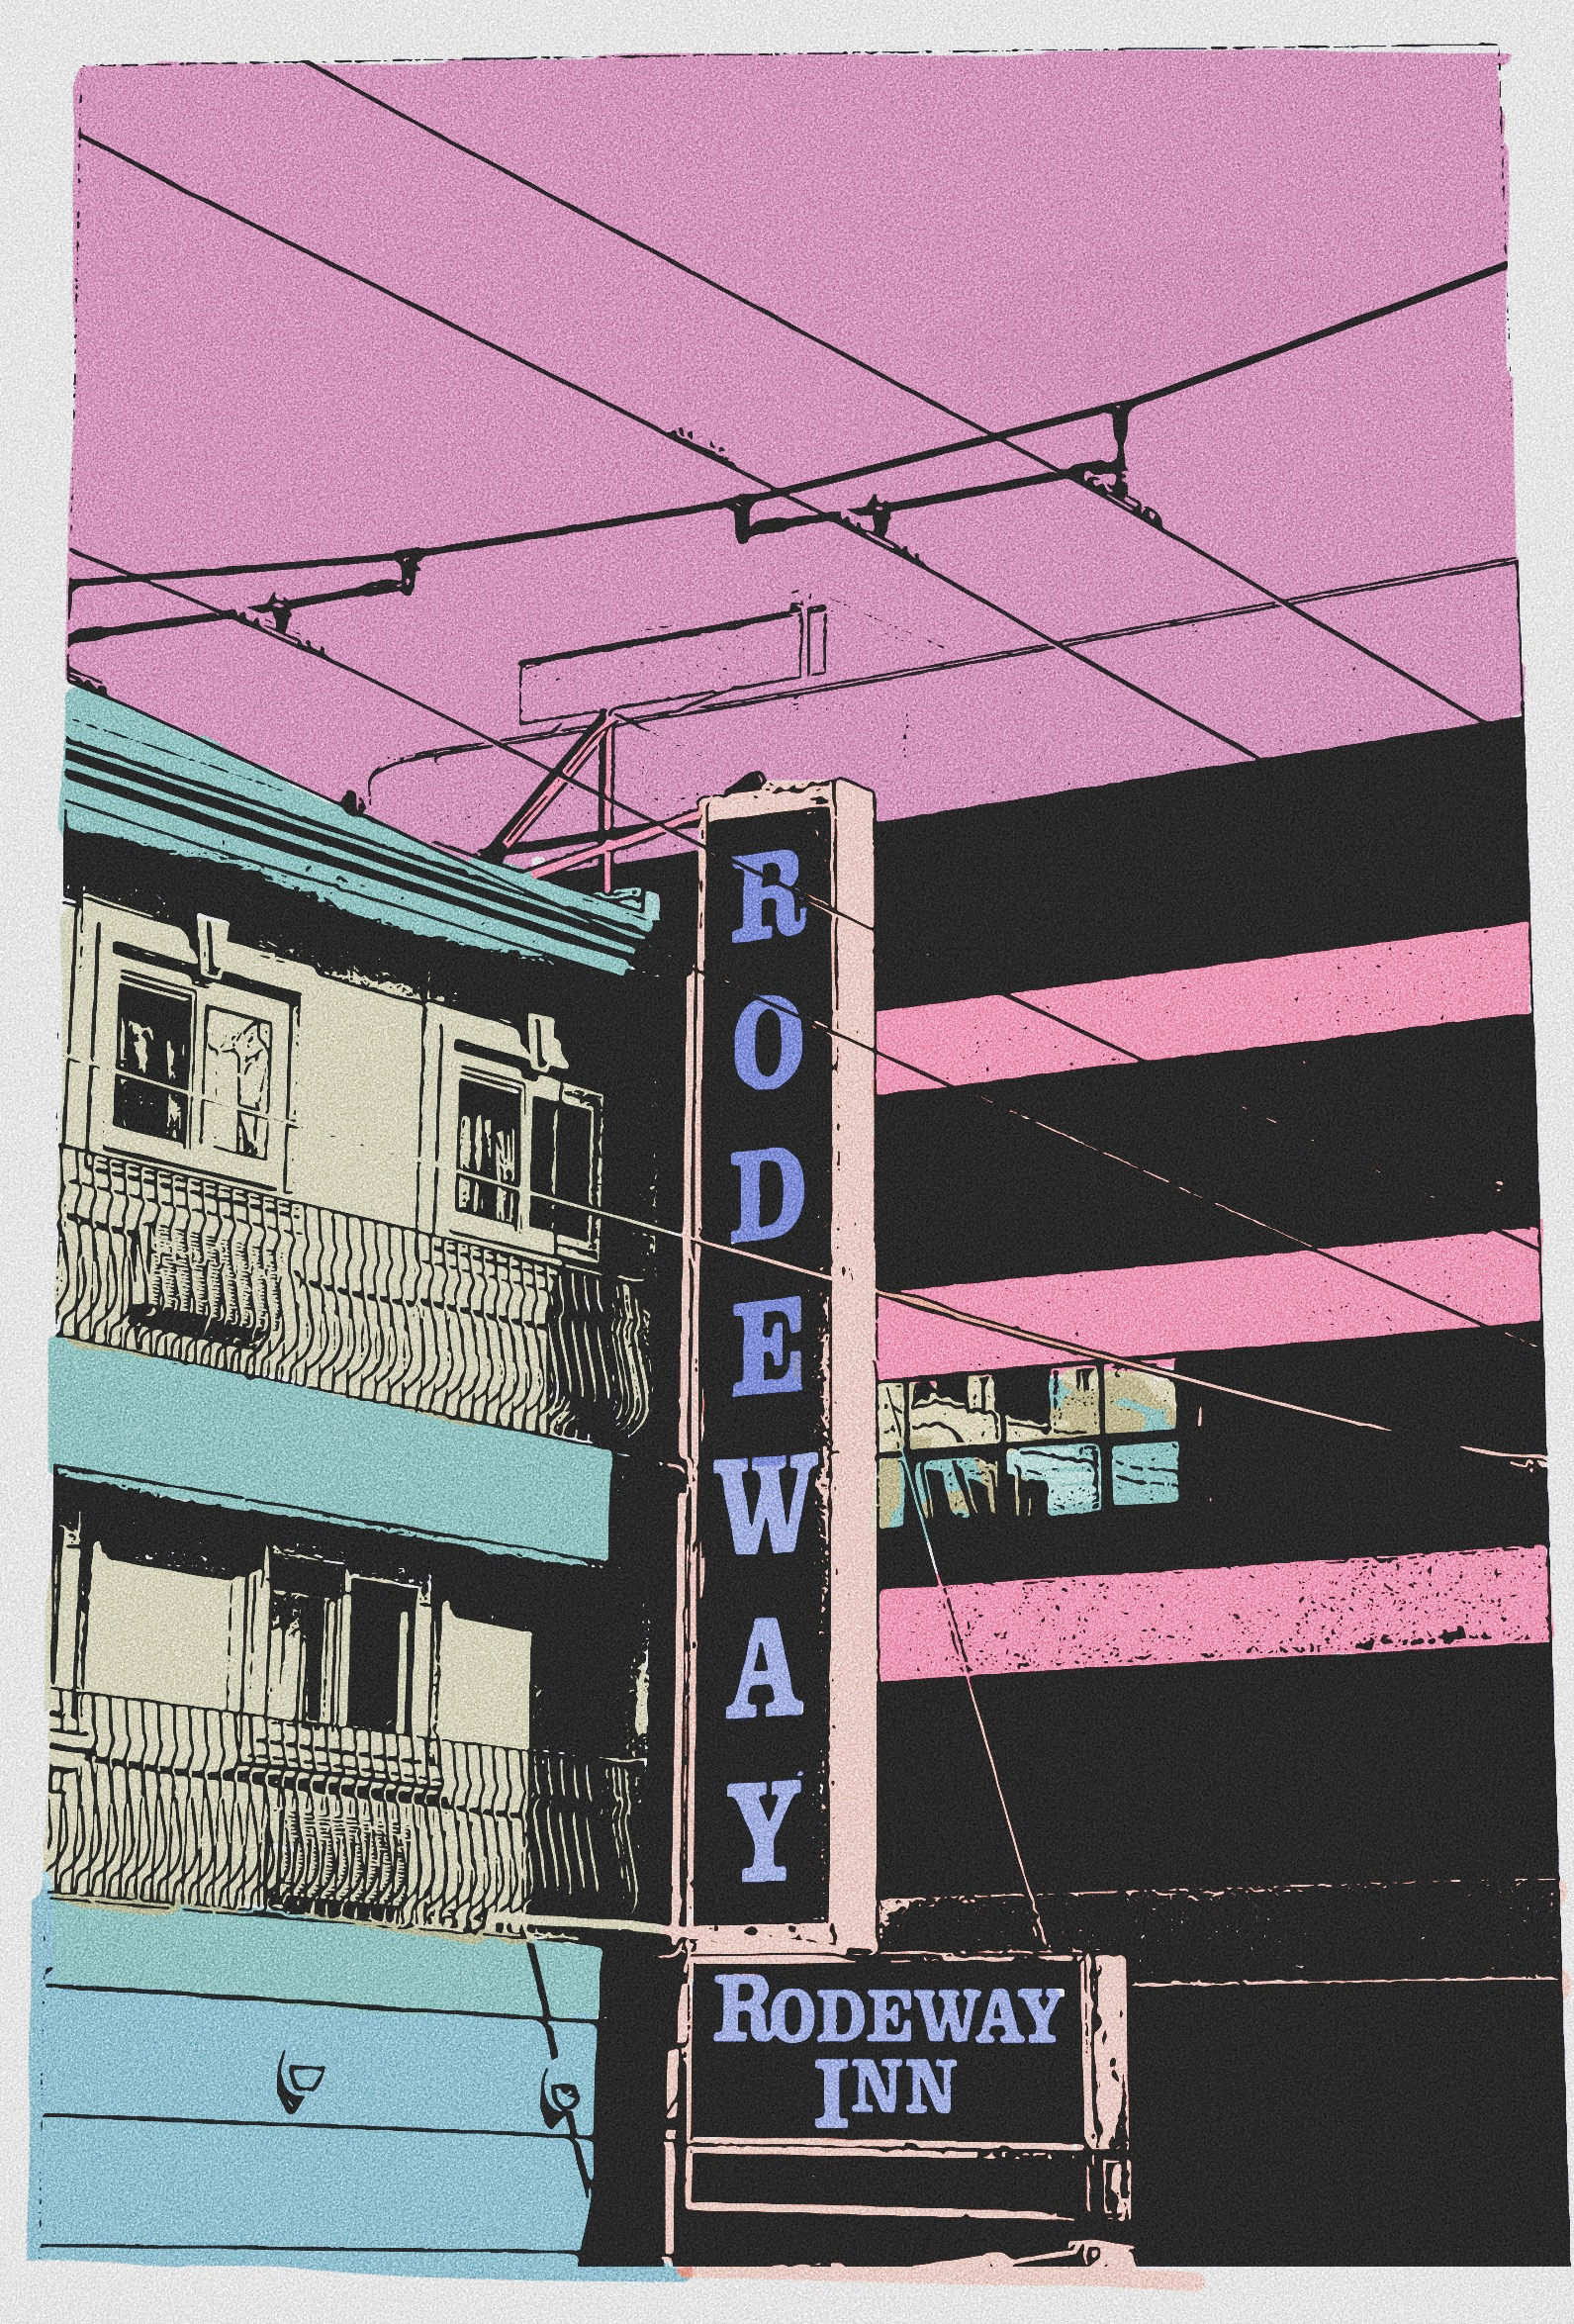 RODEWAY INN | Sophie Barrott |  Artist |